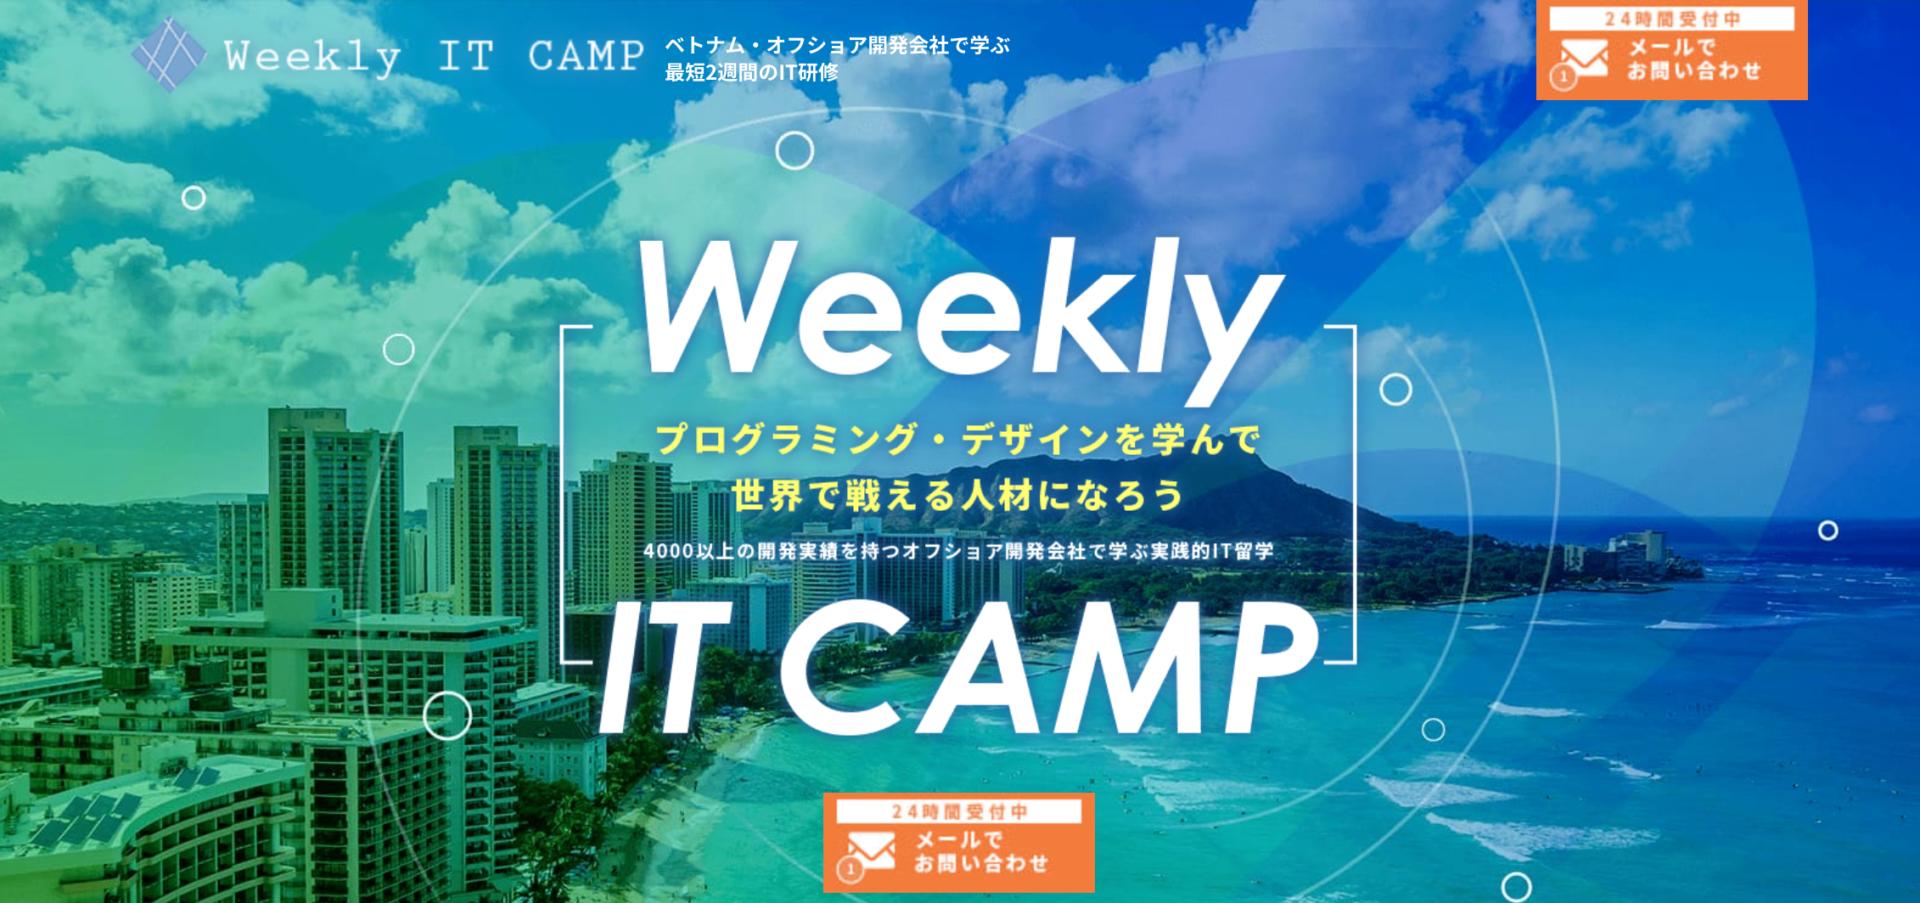 Weekly IT CAMP(ウィークリー IT キャンプ)